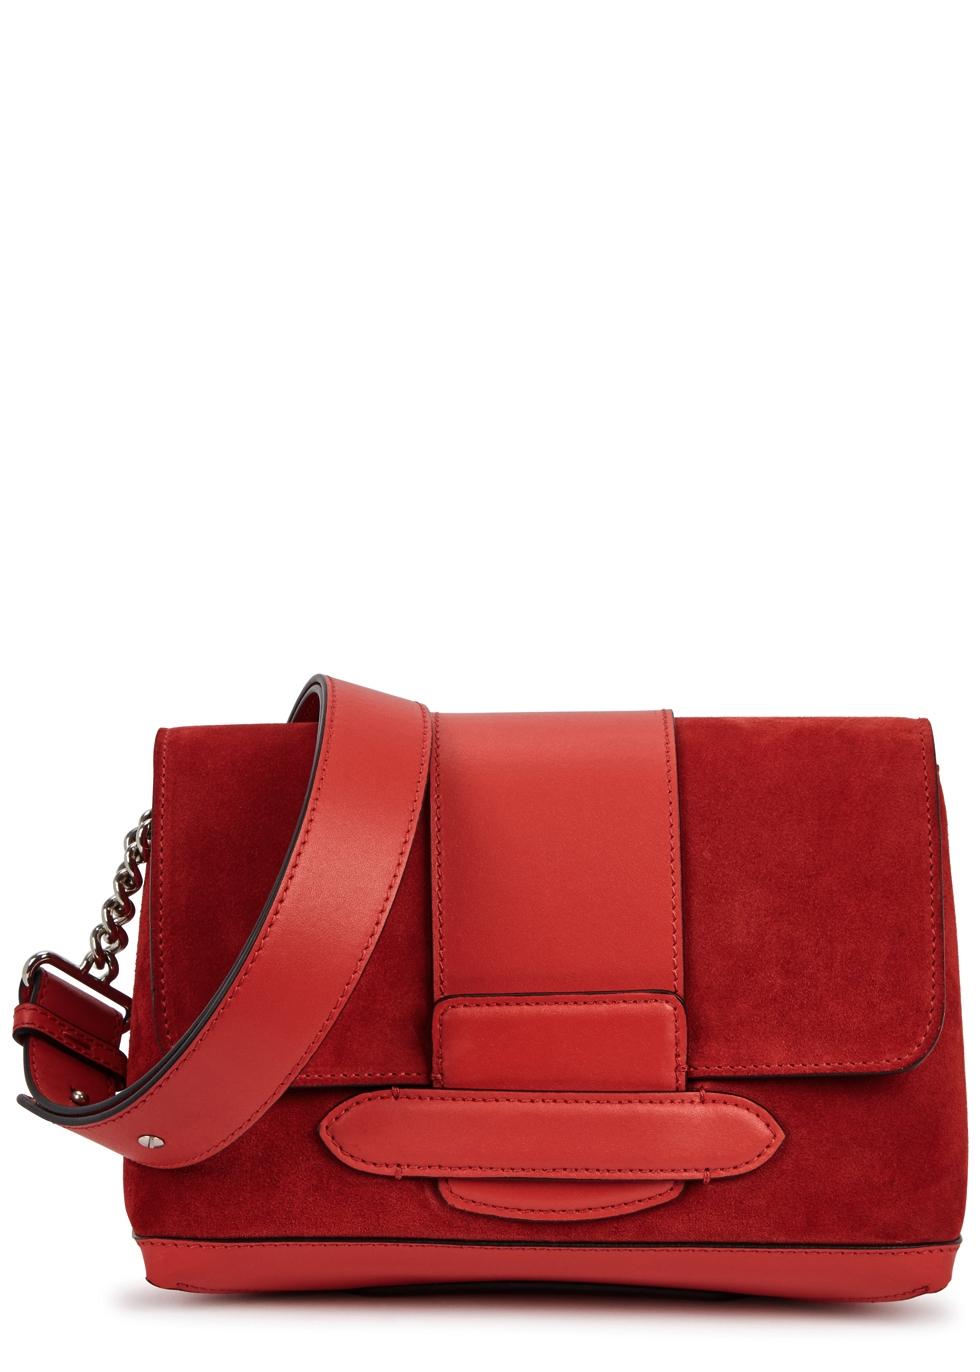 MICHINO PARIS Phedra Red Suede Shoulder Bag